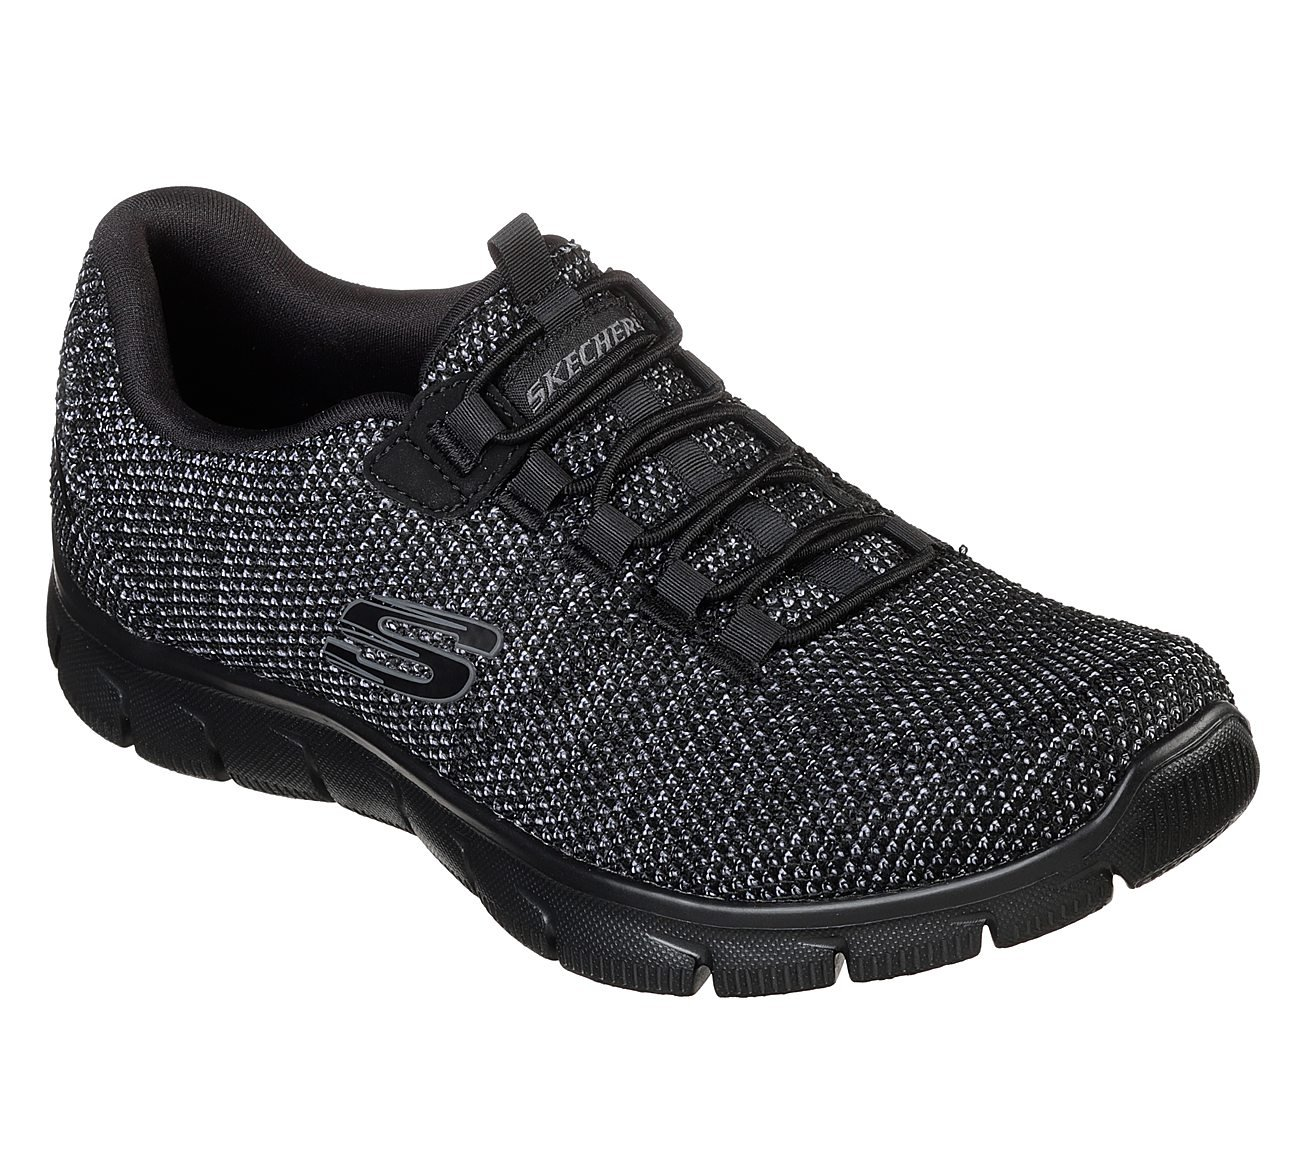 Skechers Sport Women's Empire Fashion Sneaker B07FMJVZV7 6 (B)M US|Black Knit